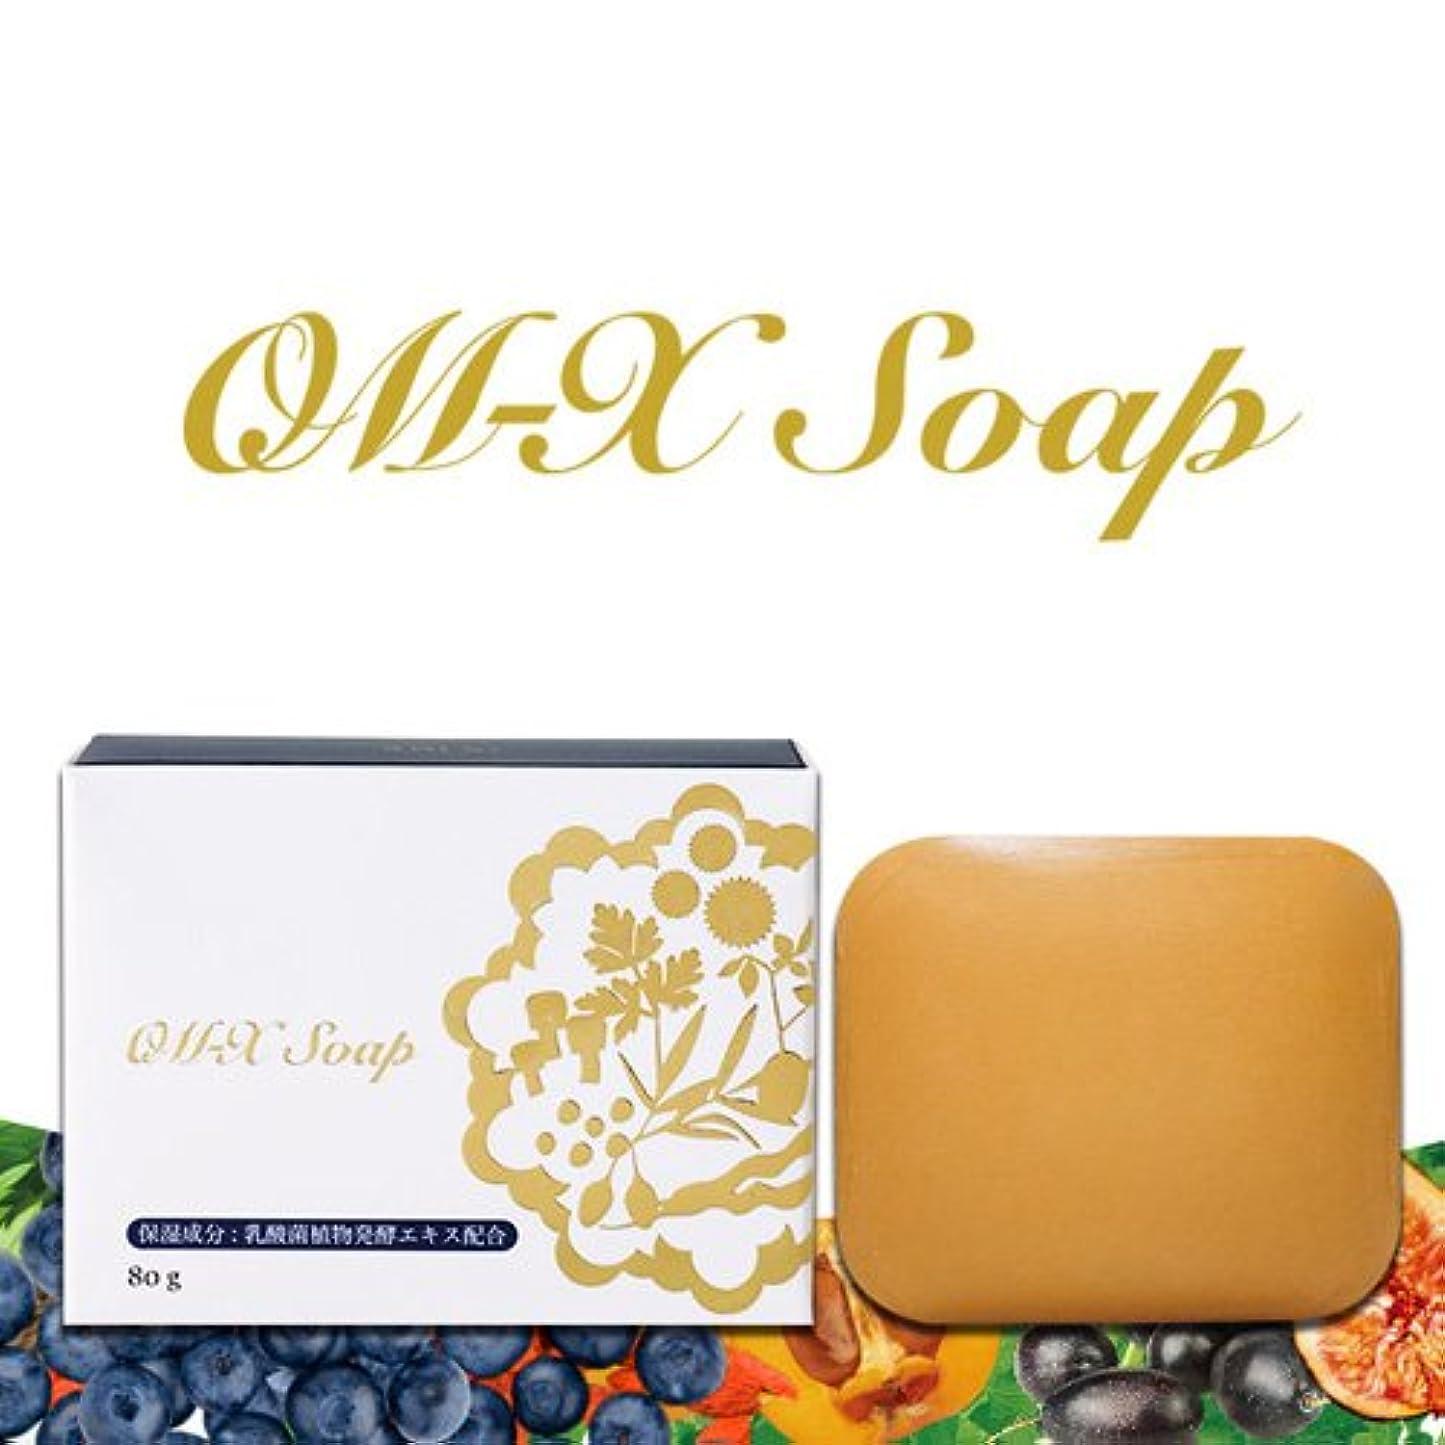 OM-X Soap